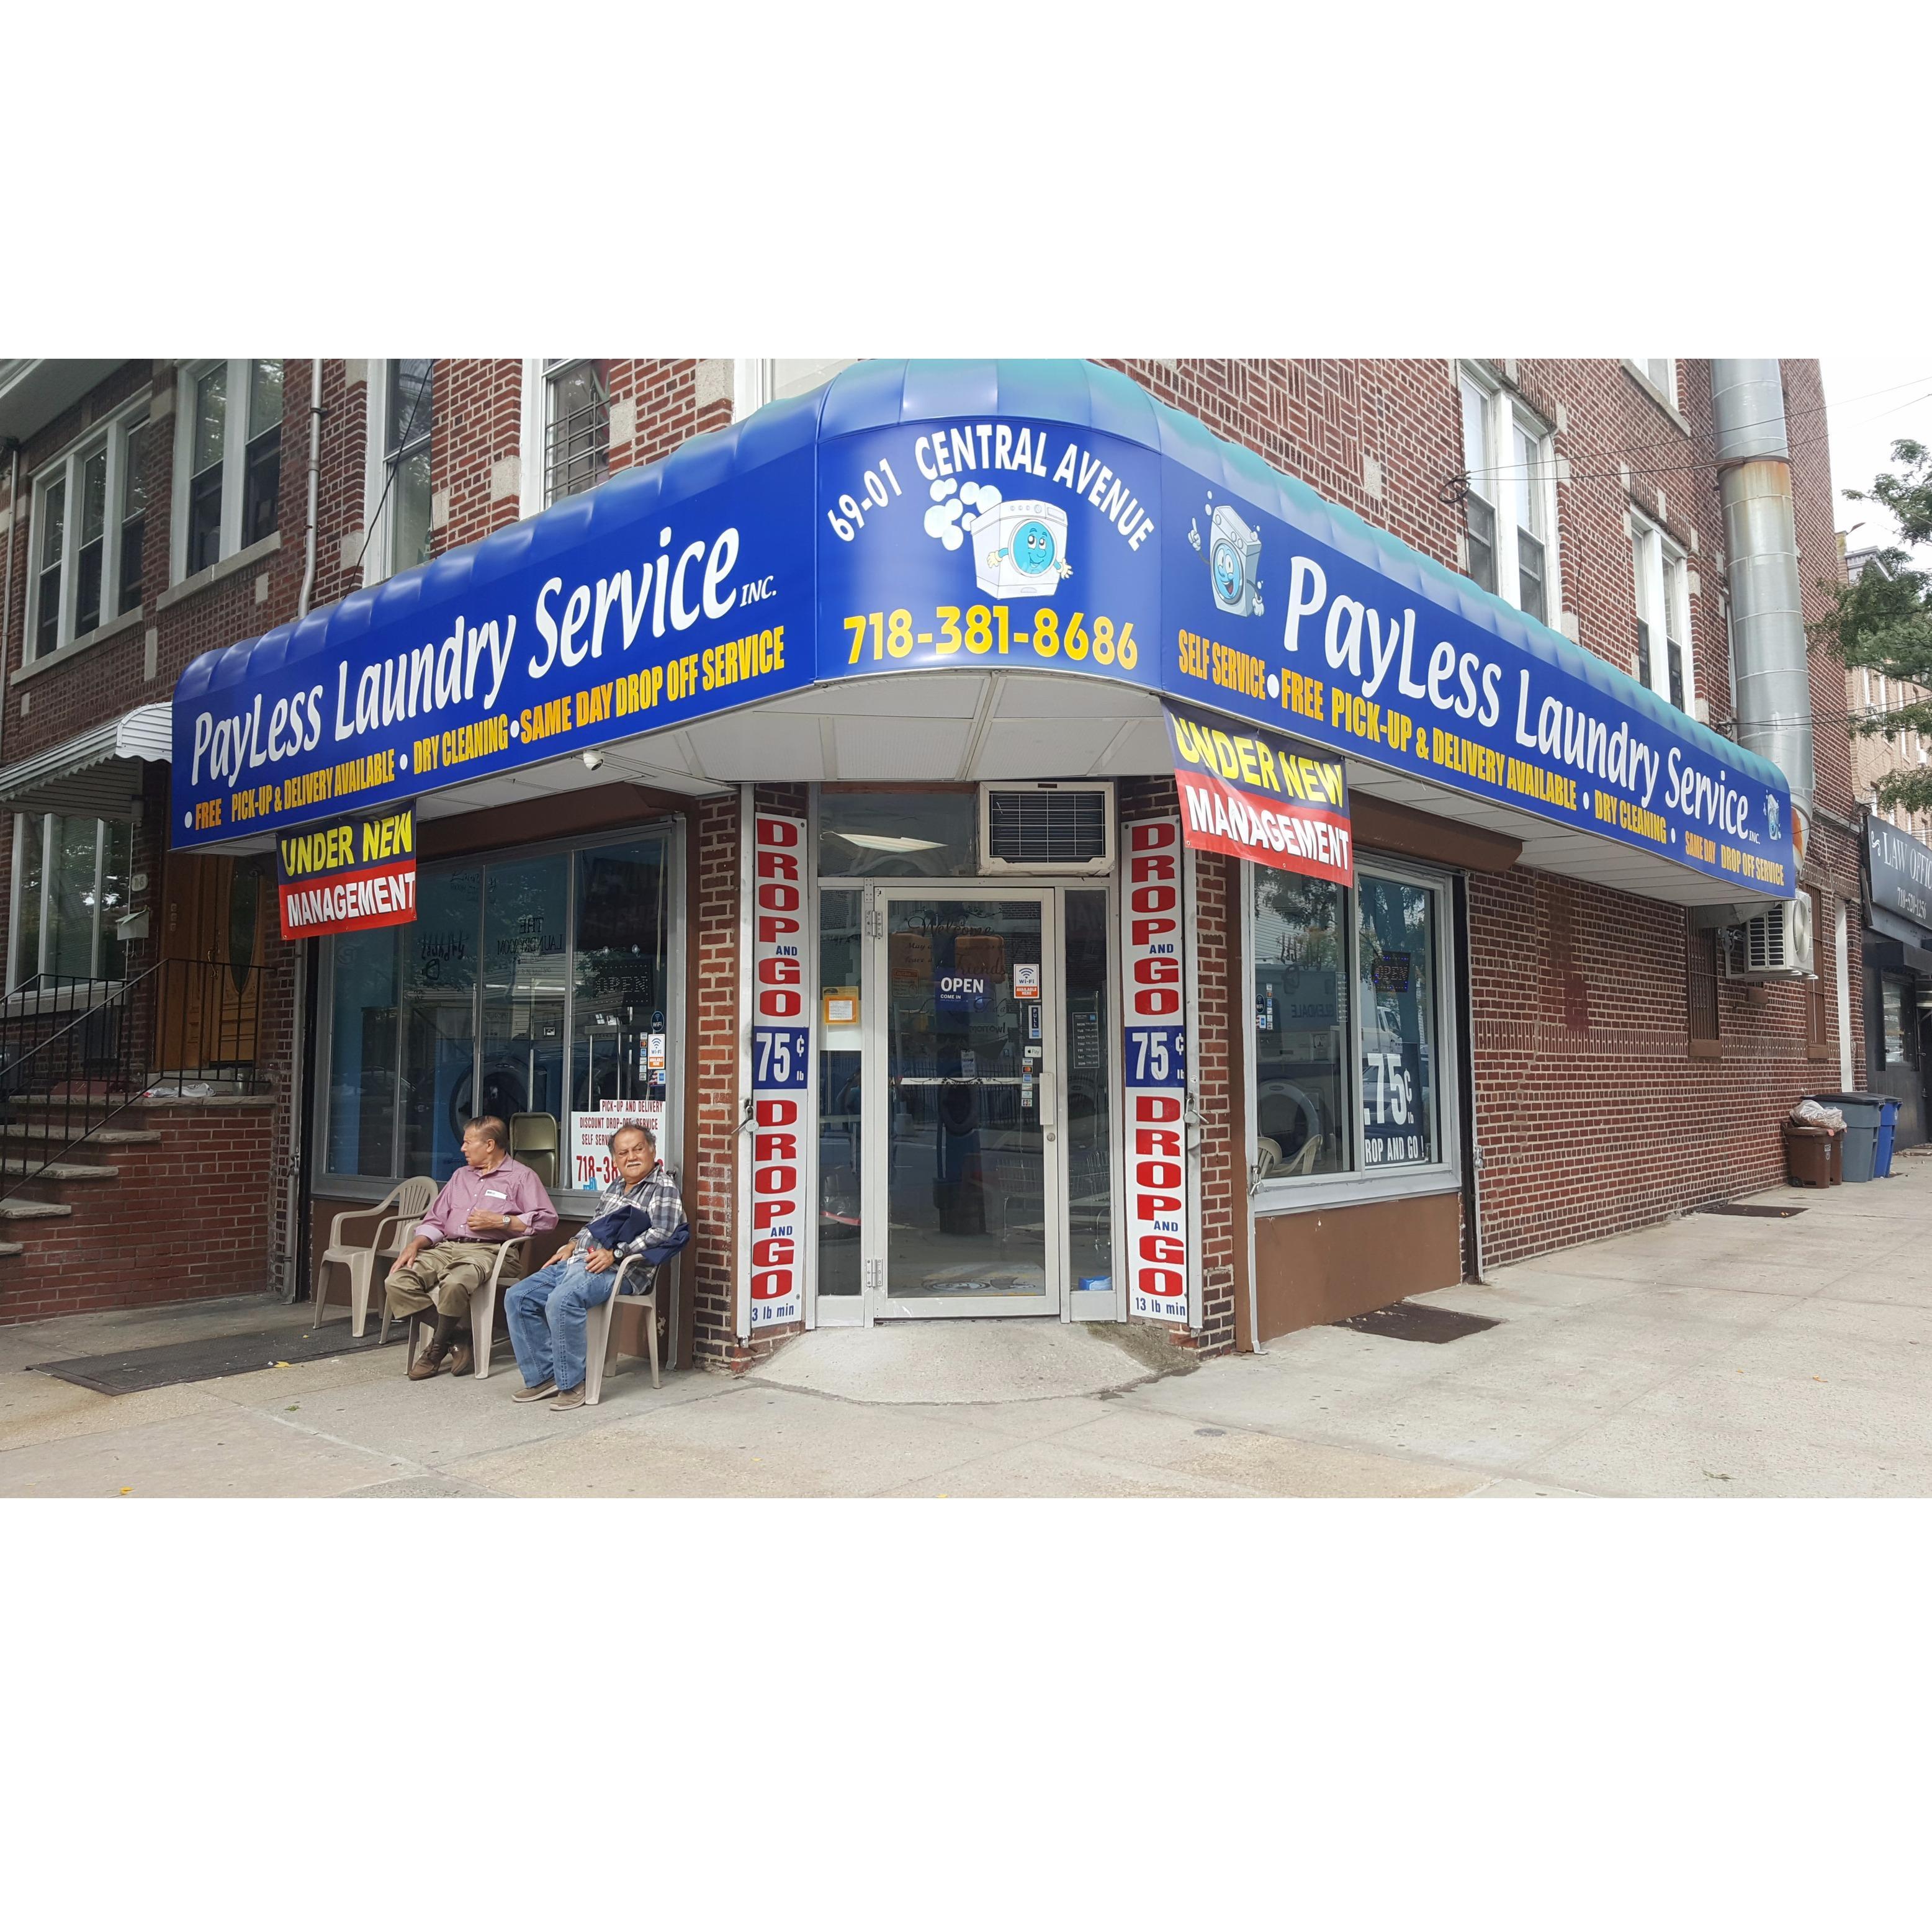 Payless Laundry Service, Inc.